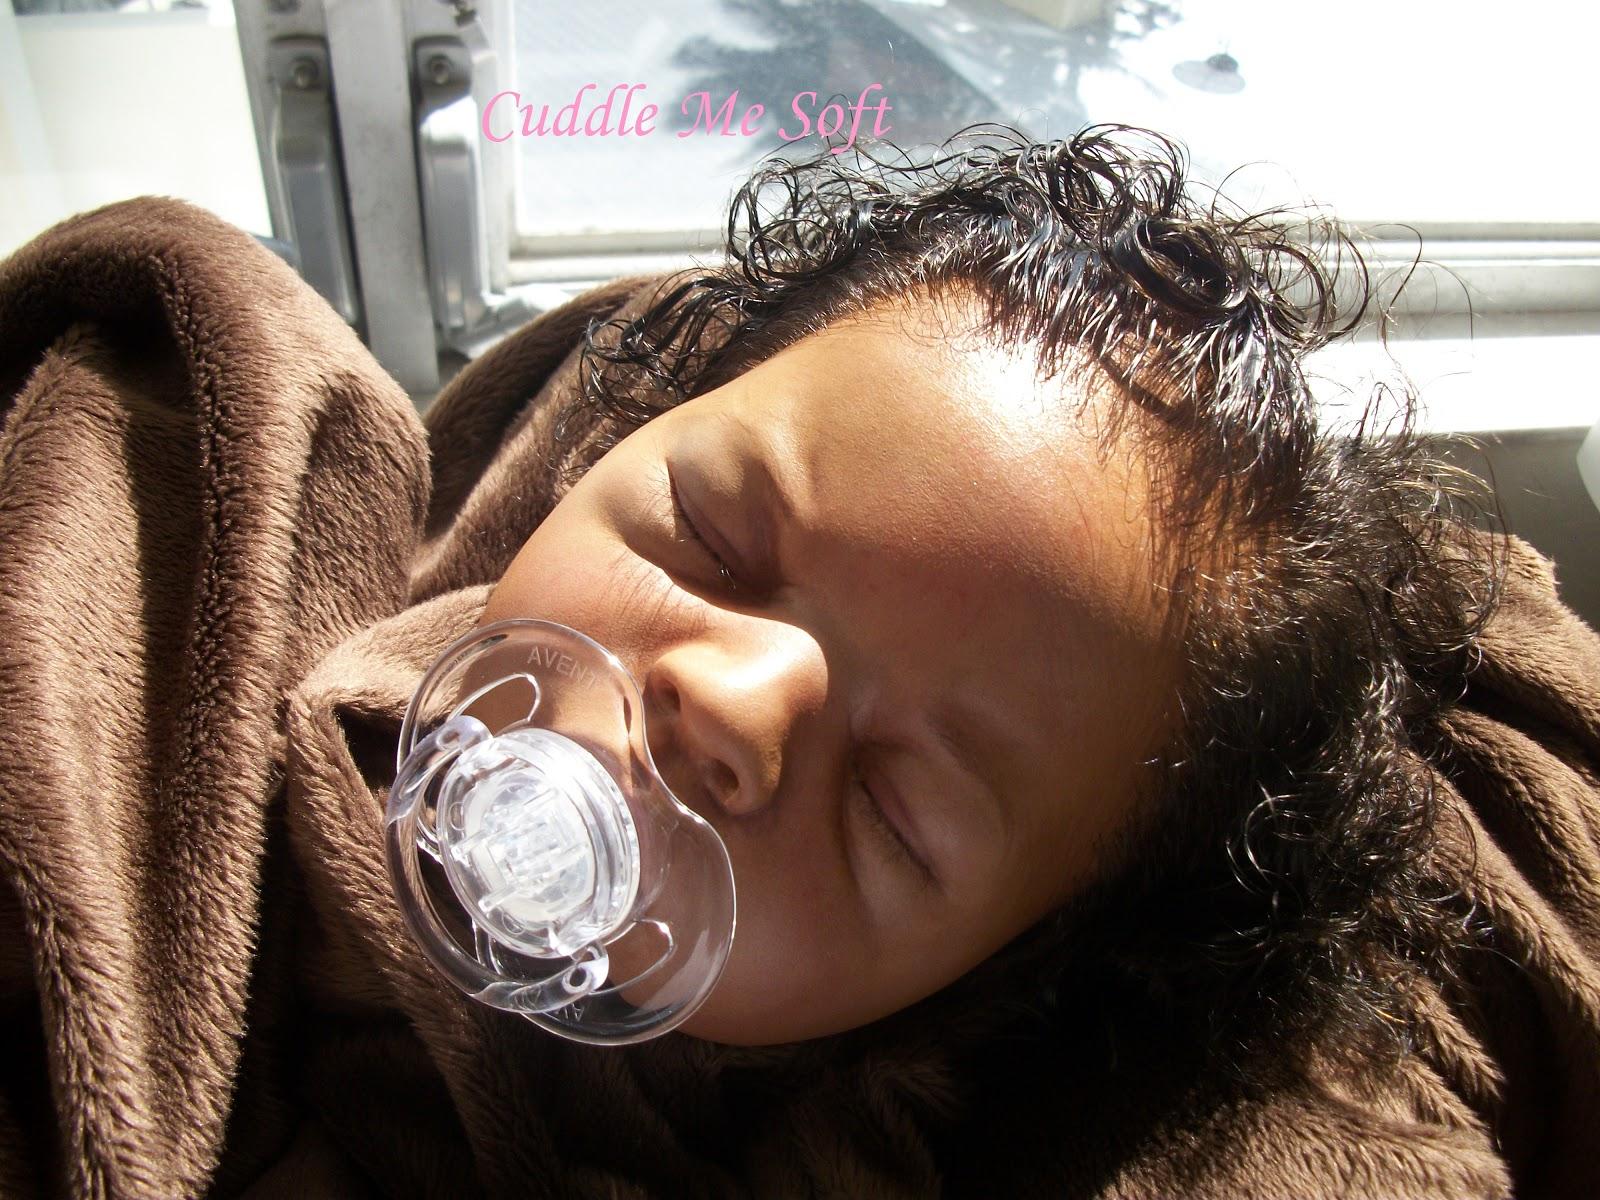 My life & adventures in reborning Cuddle Me Soft Reborn ...